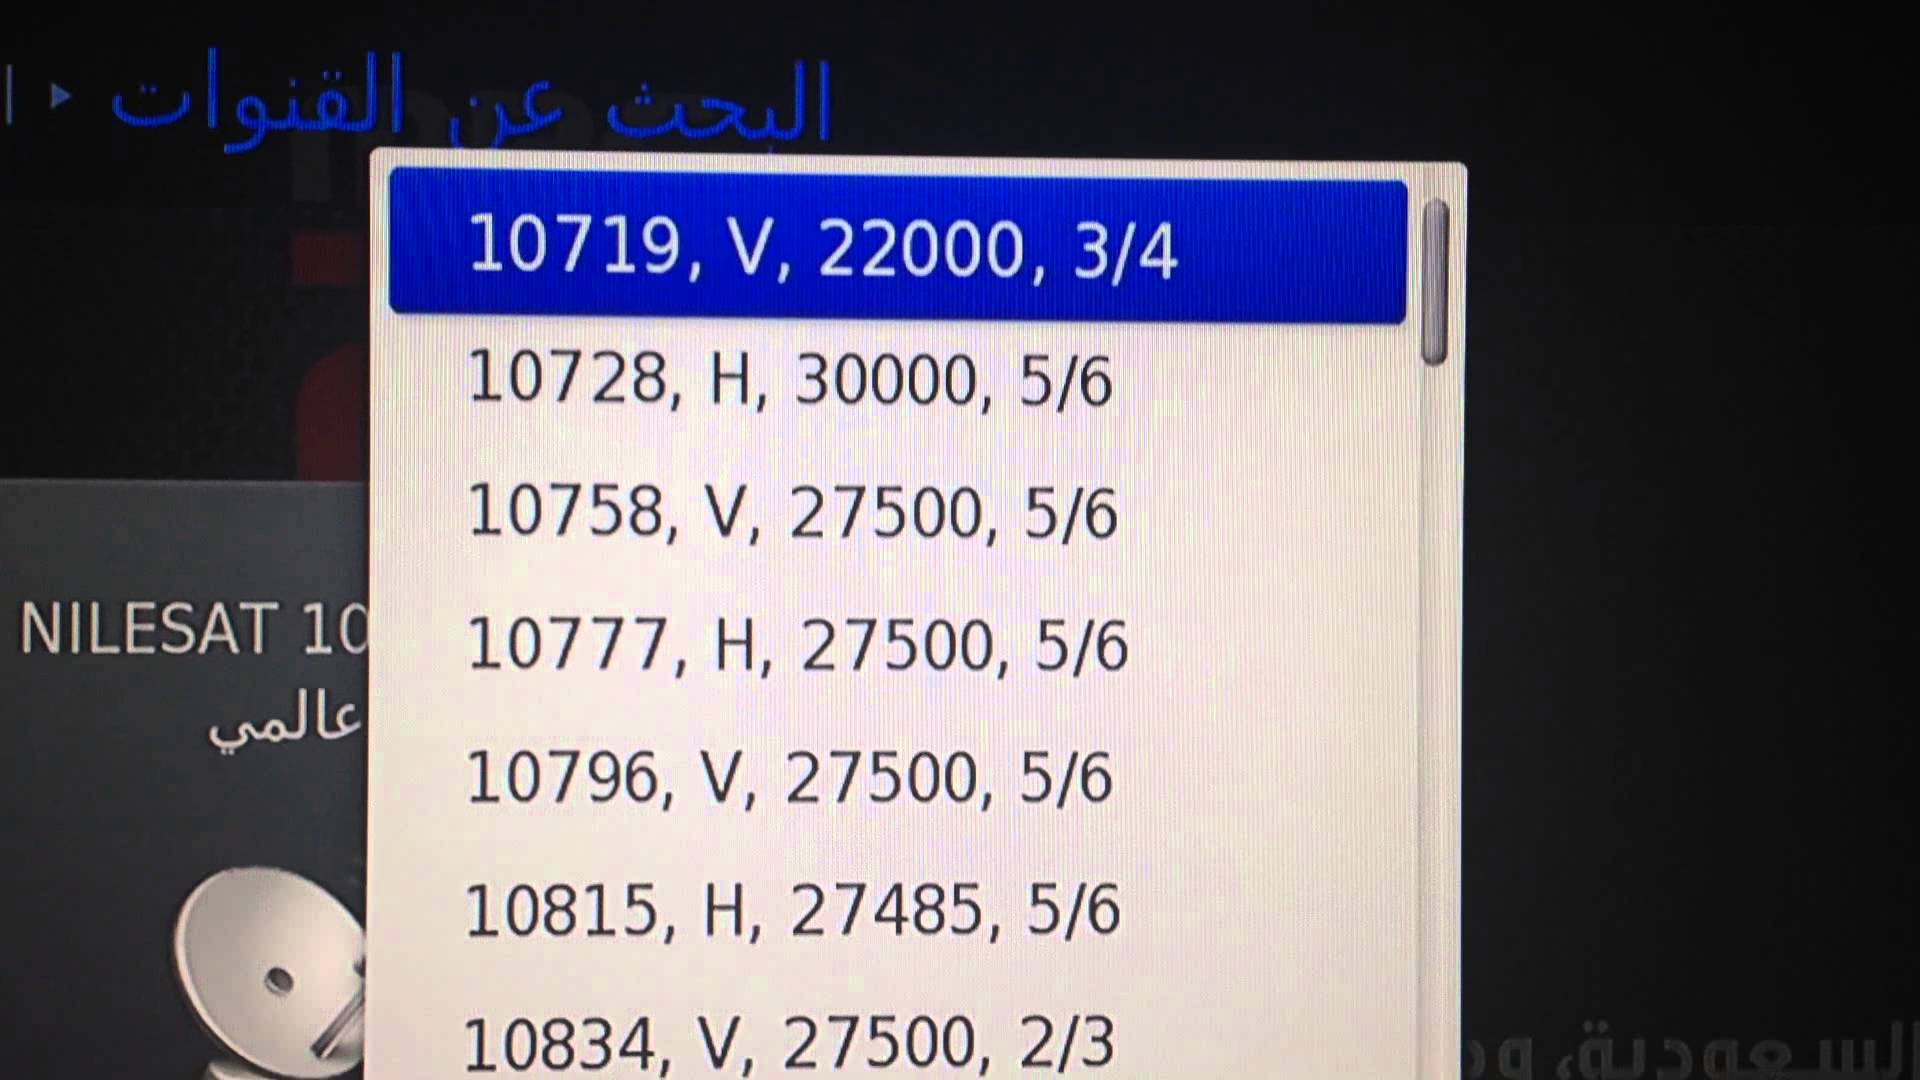 تردد ام بي سي برو شاهد جميع مباريات الدوري السعودي علي ام